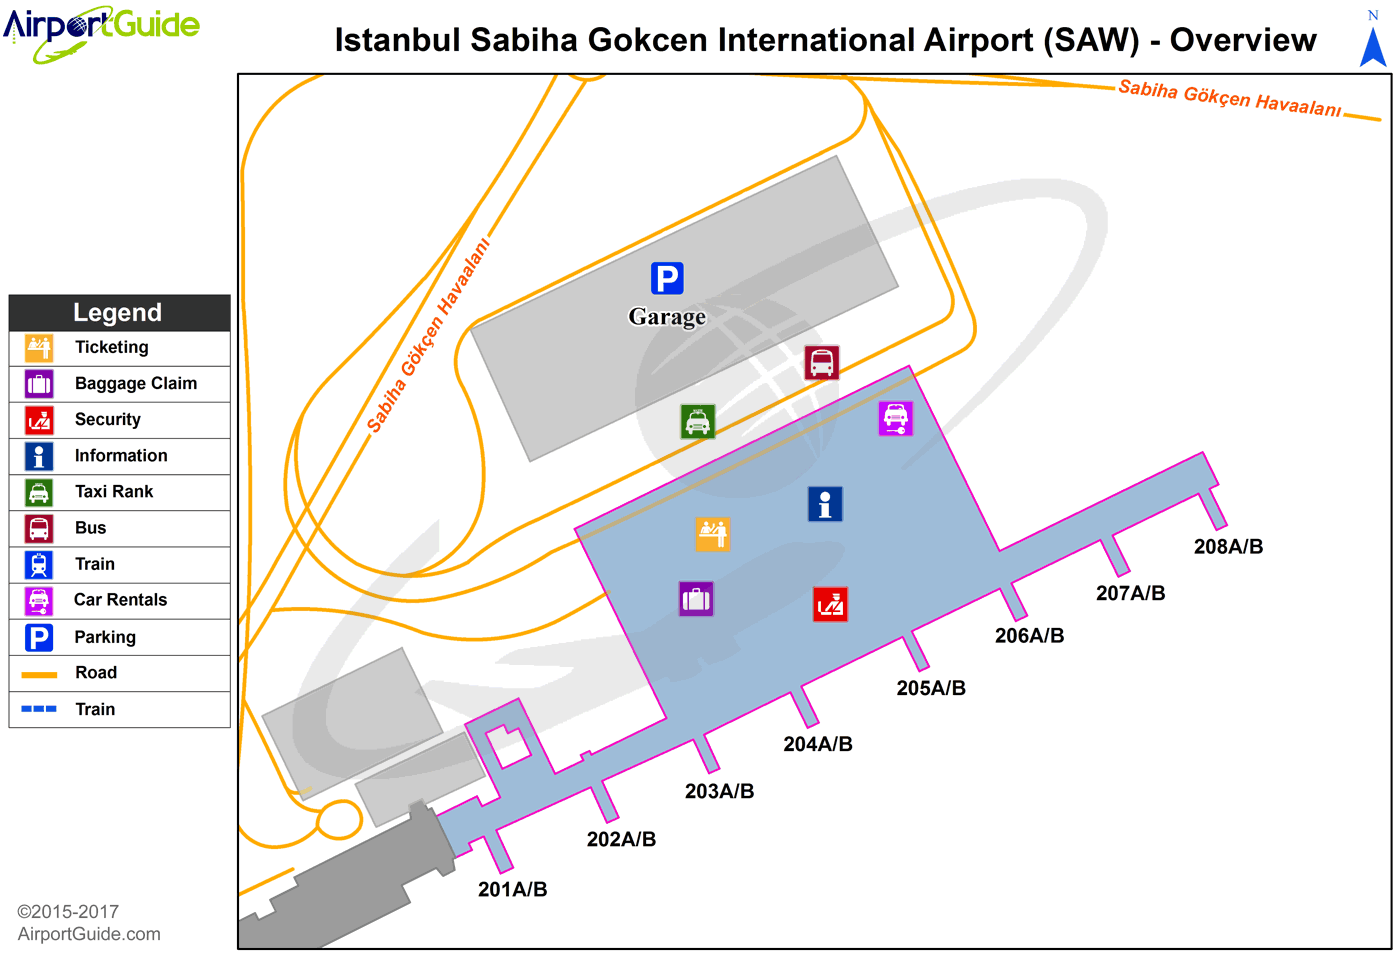 İstanbul Sabiha Gökçen International (SAW) Airport